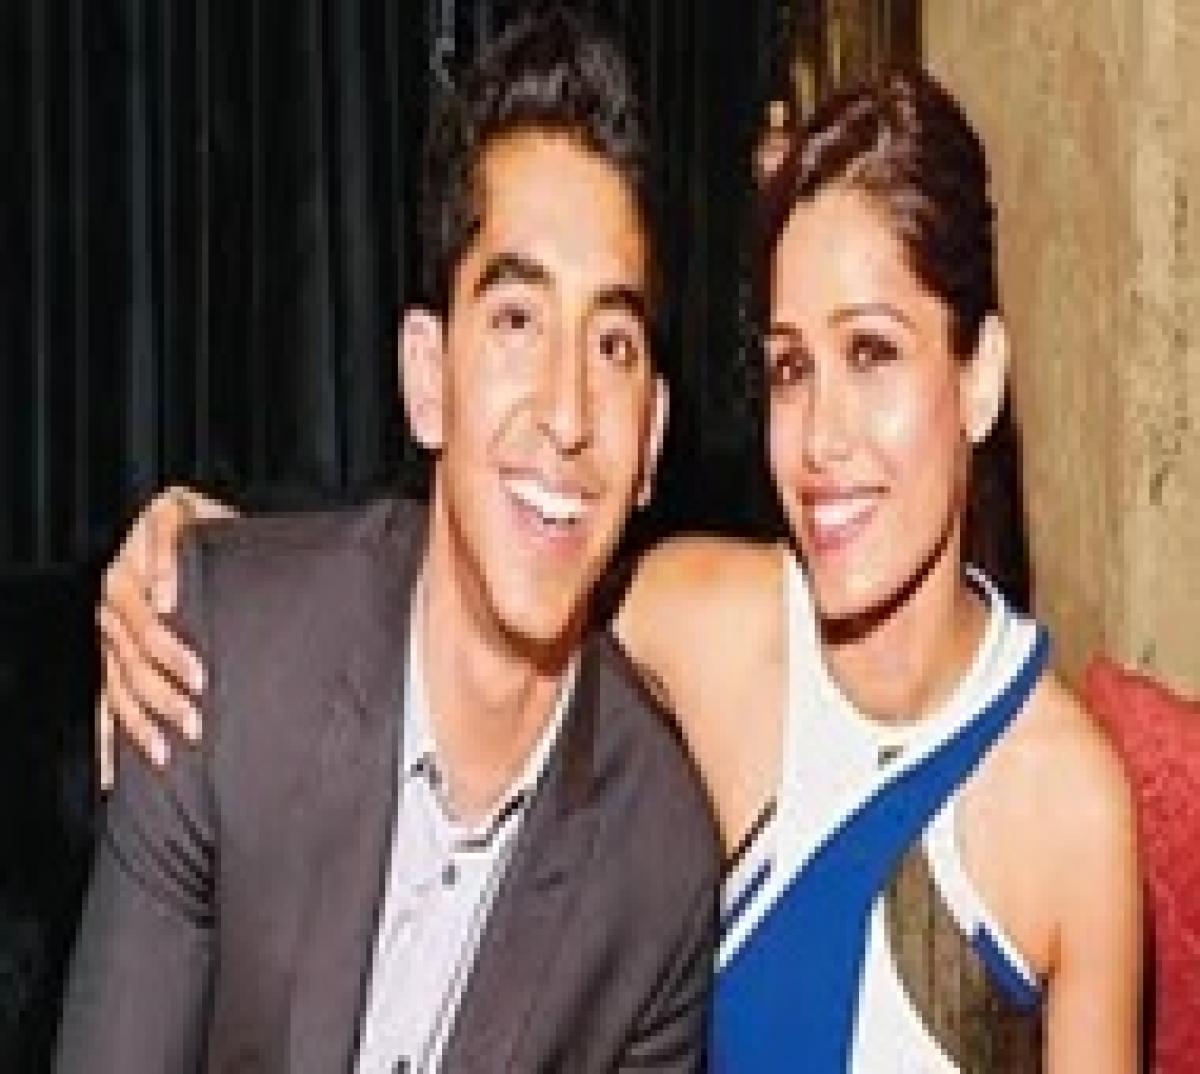 Dev Patel still 'best friends' with ex Freida Pinto